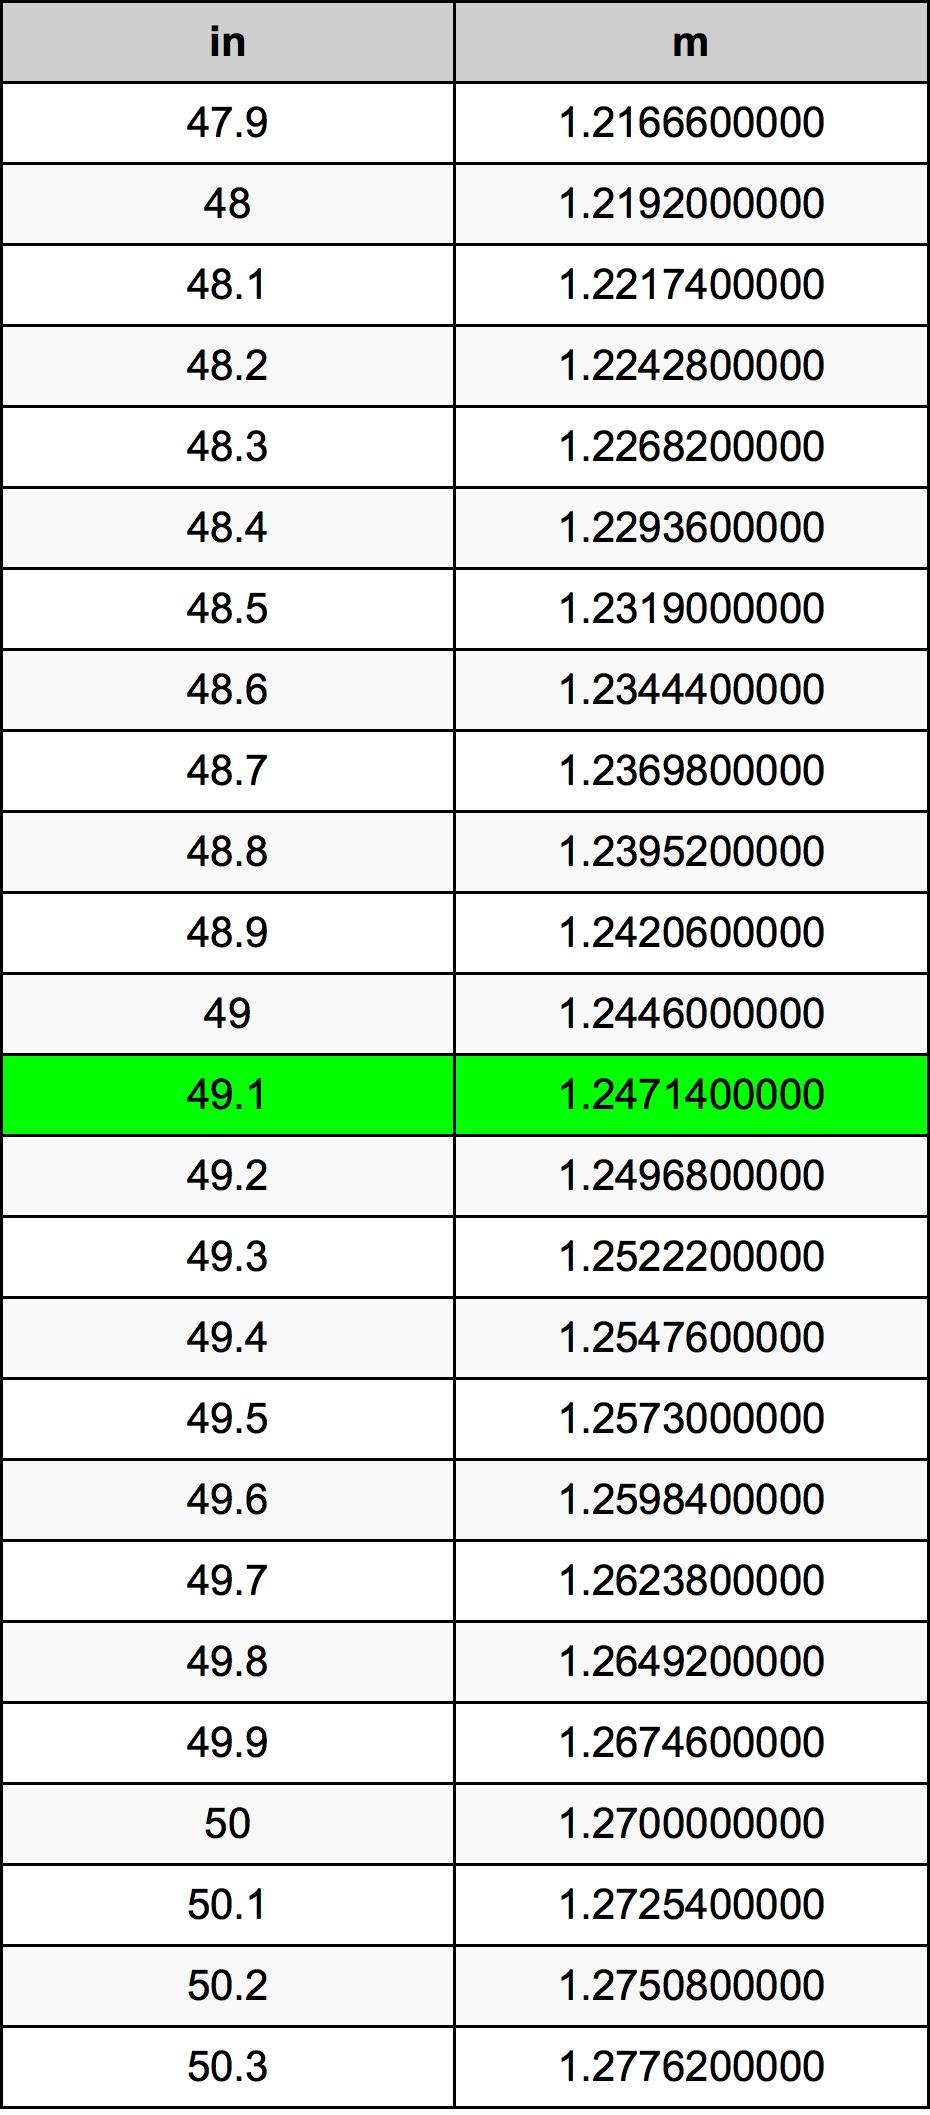 49.1 дюйм Таблица преобразования